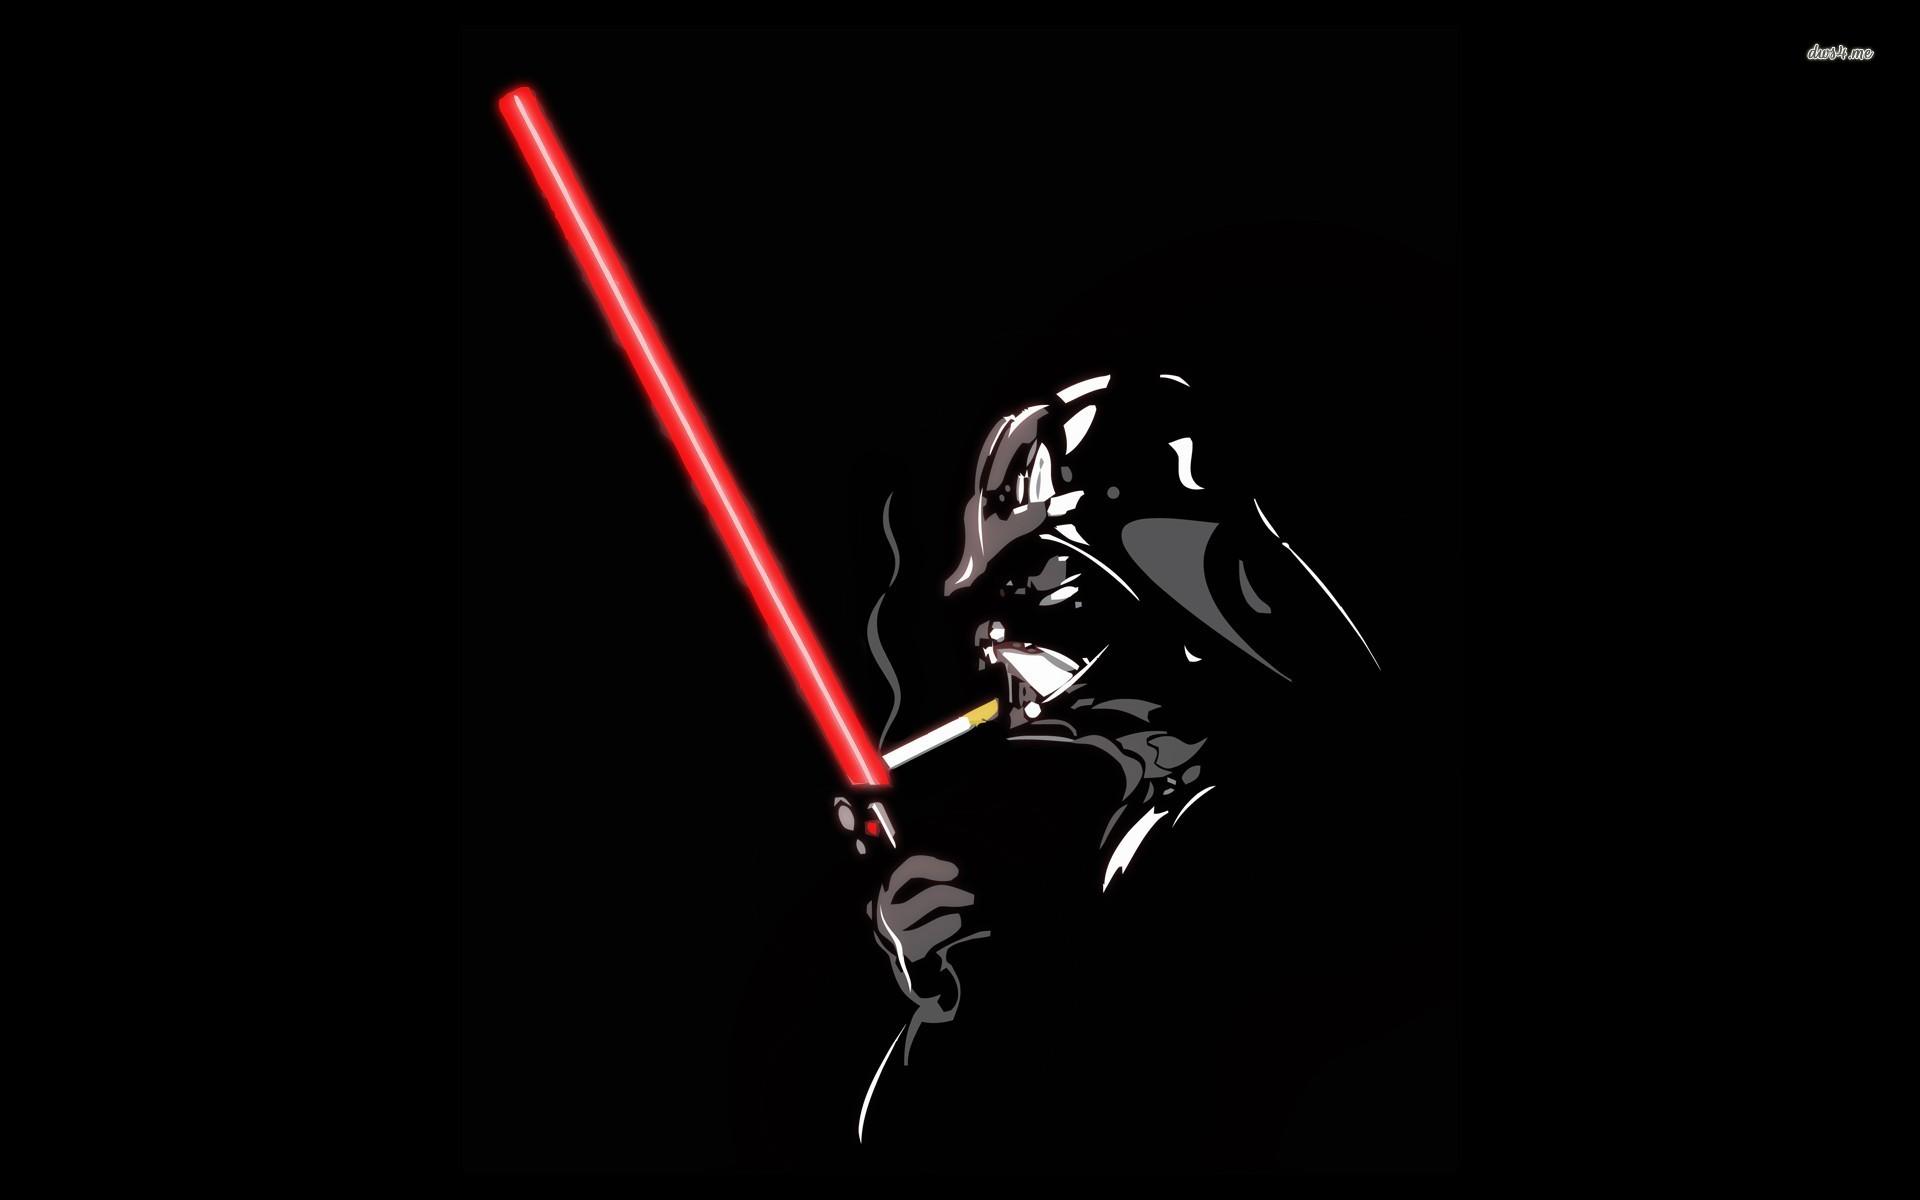 1440x900px Black Darth Vader Wallpaper 348442 1920x1200